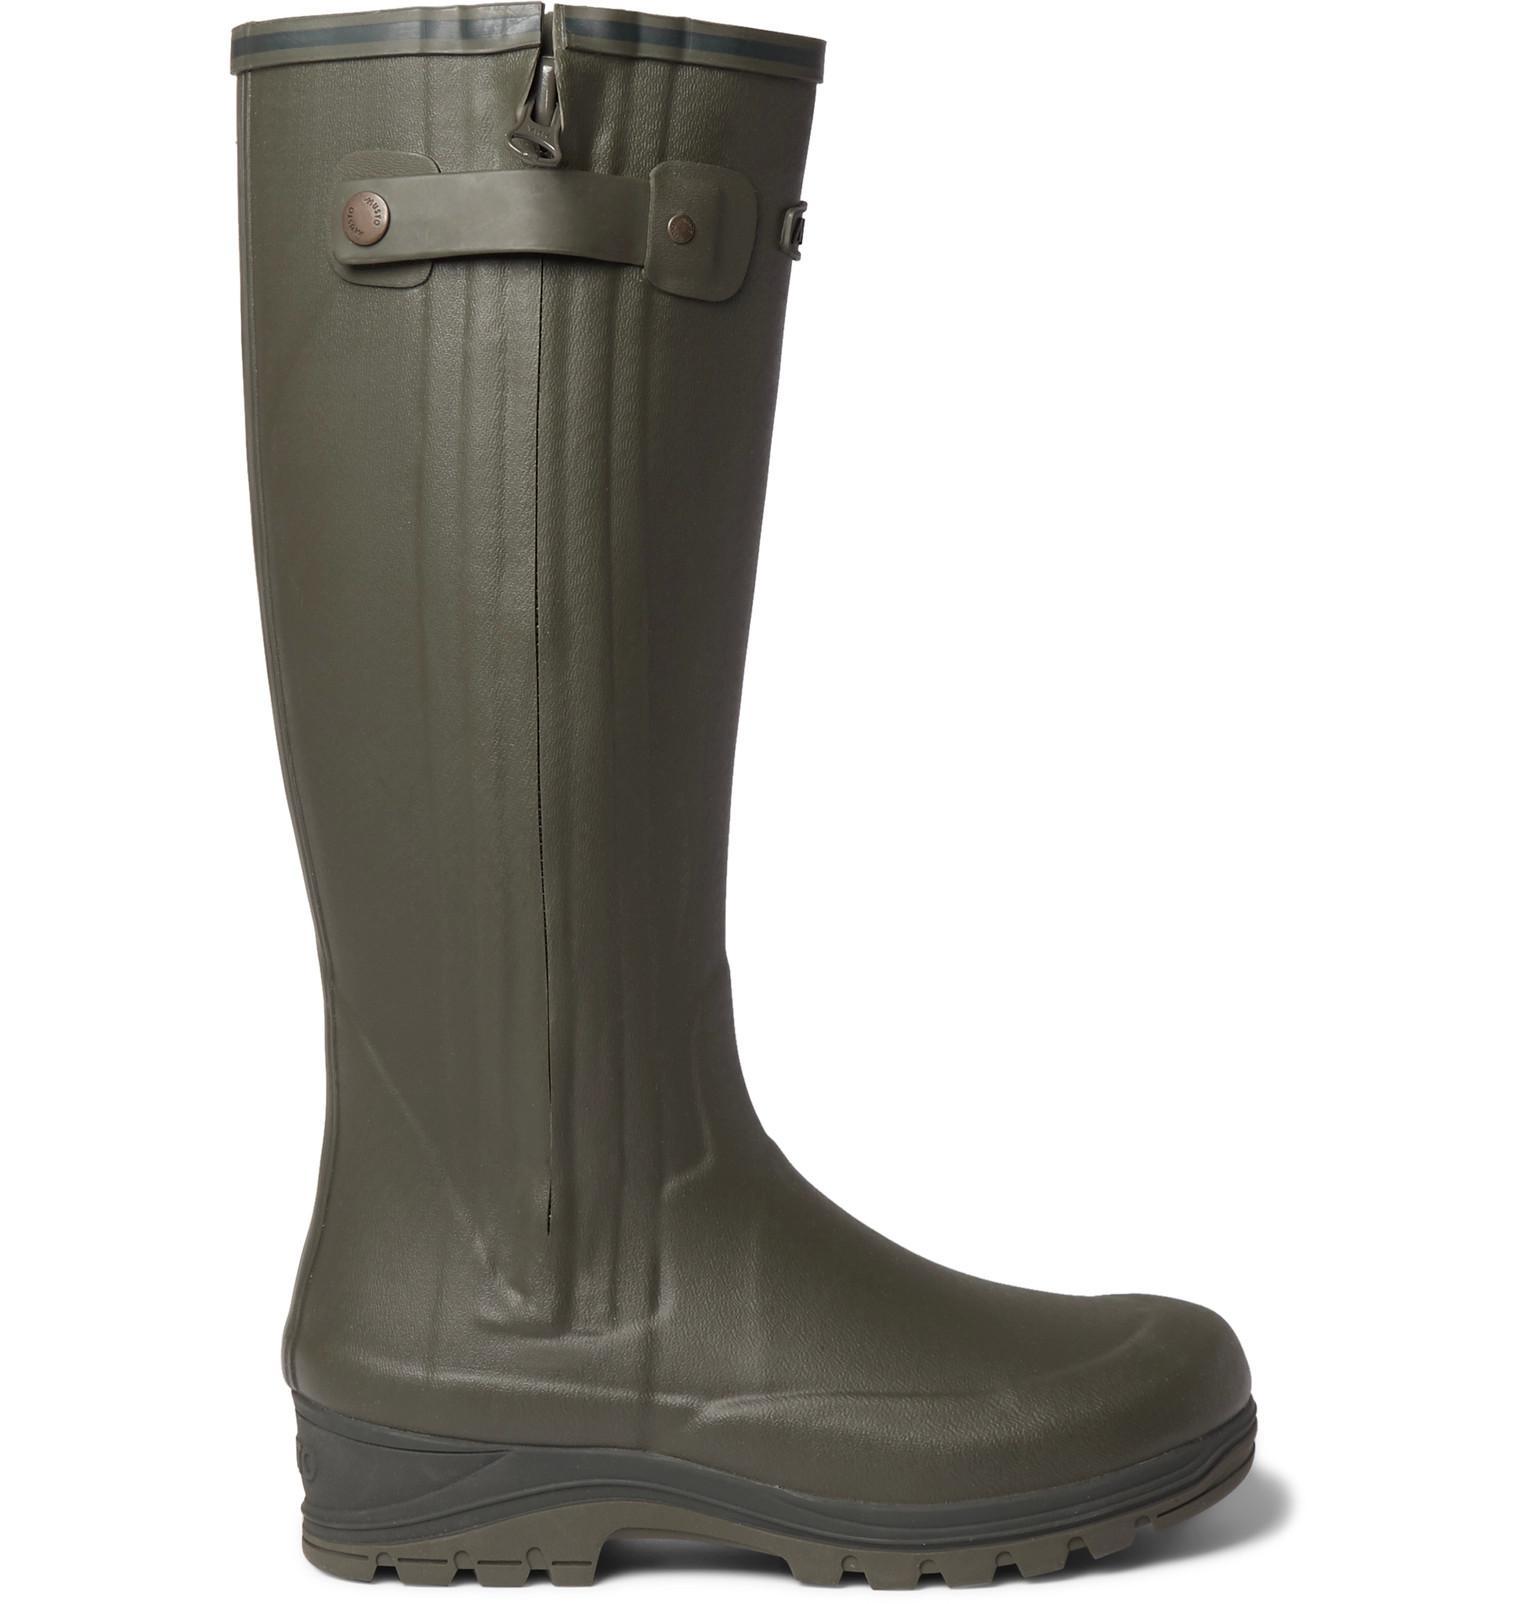 Musto Shooting Brampton Rubber Wellington Boots In Green